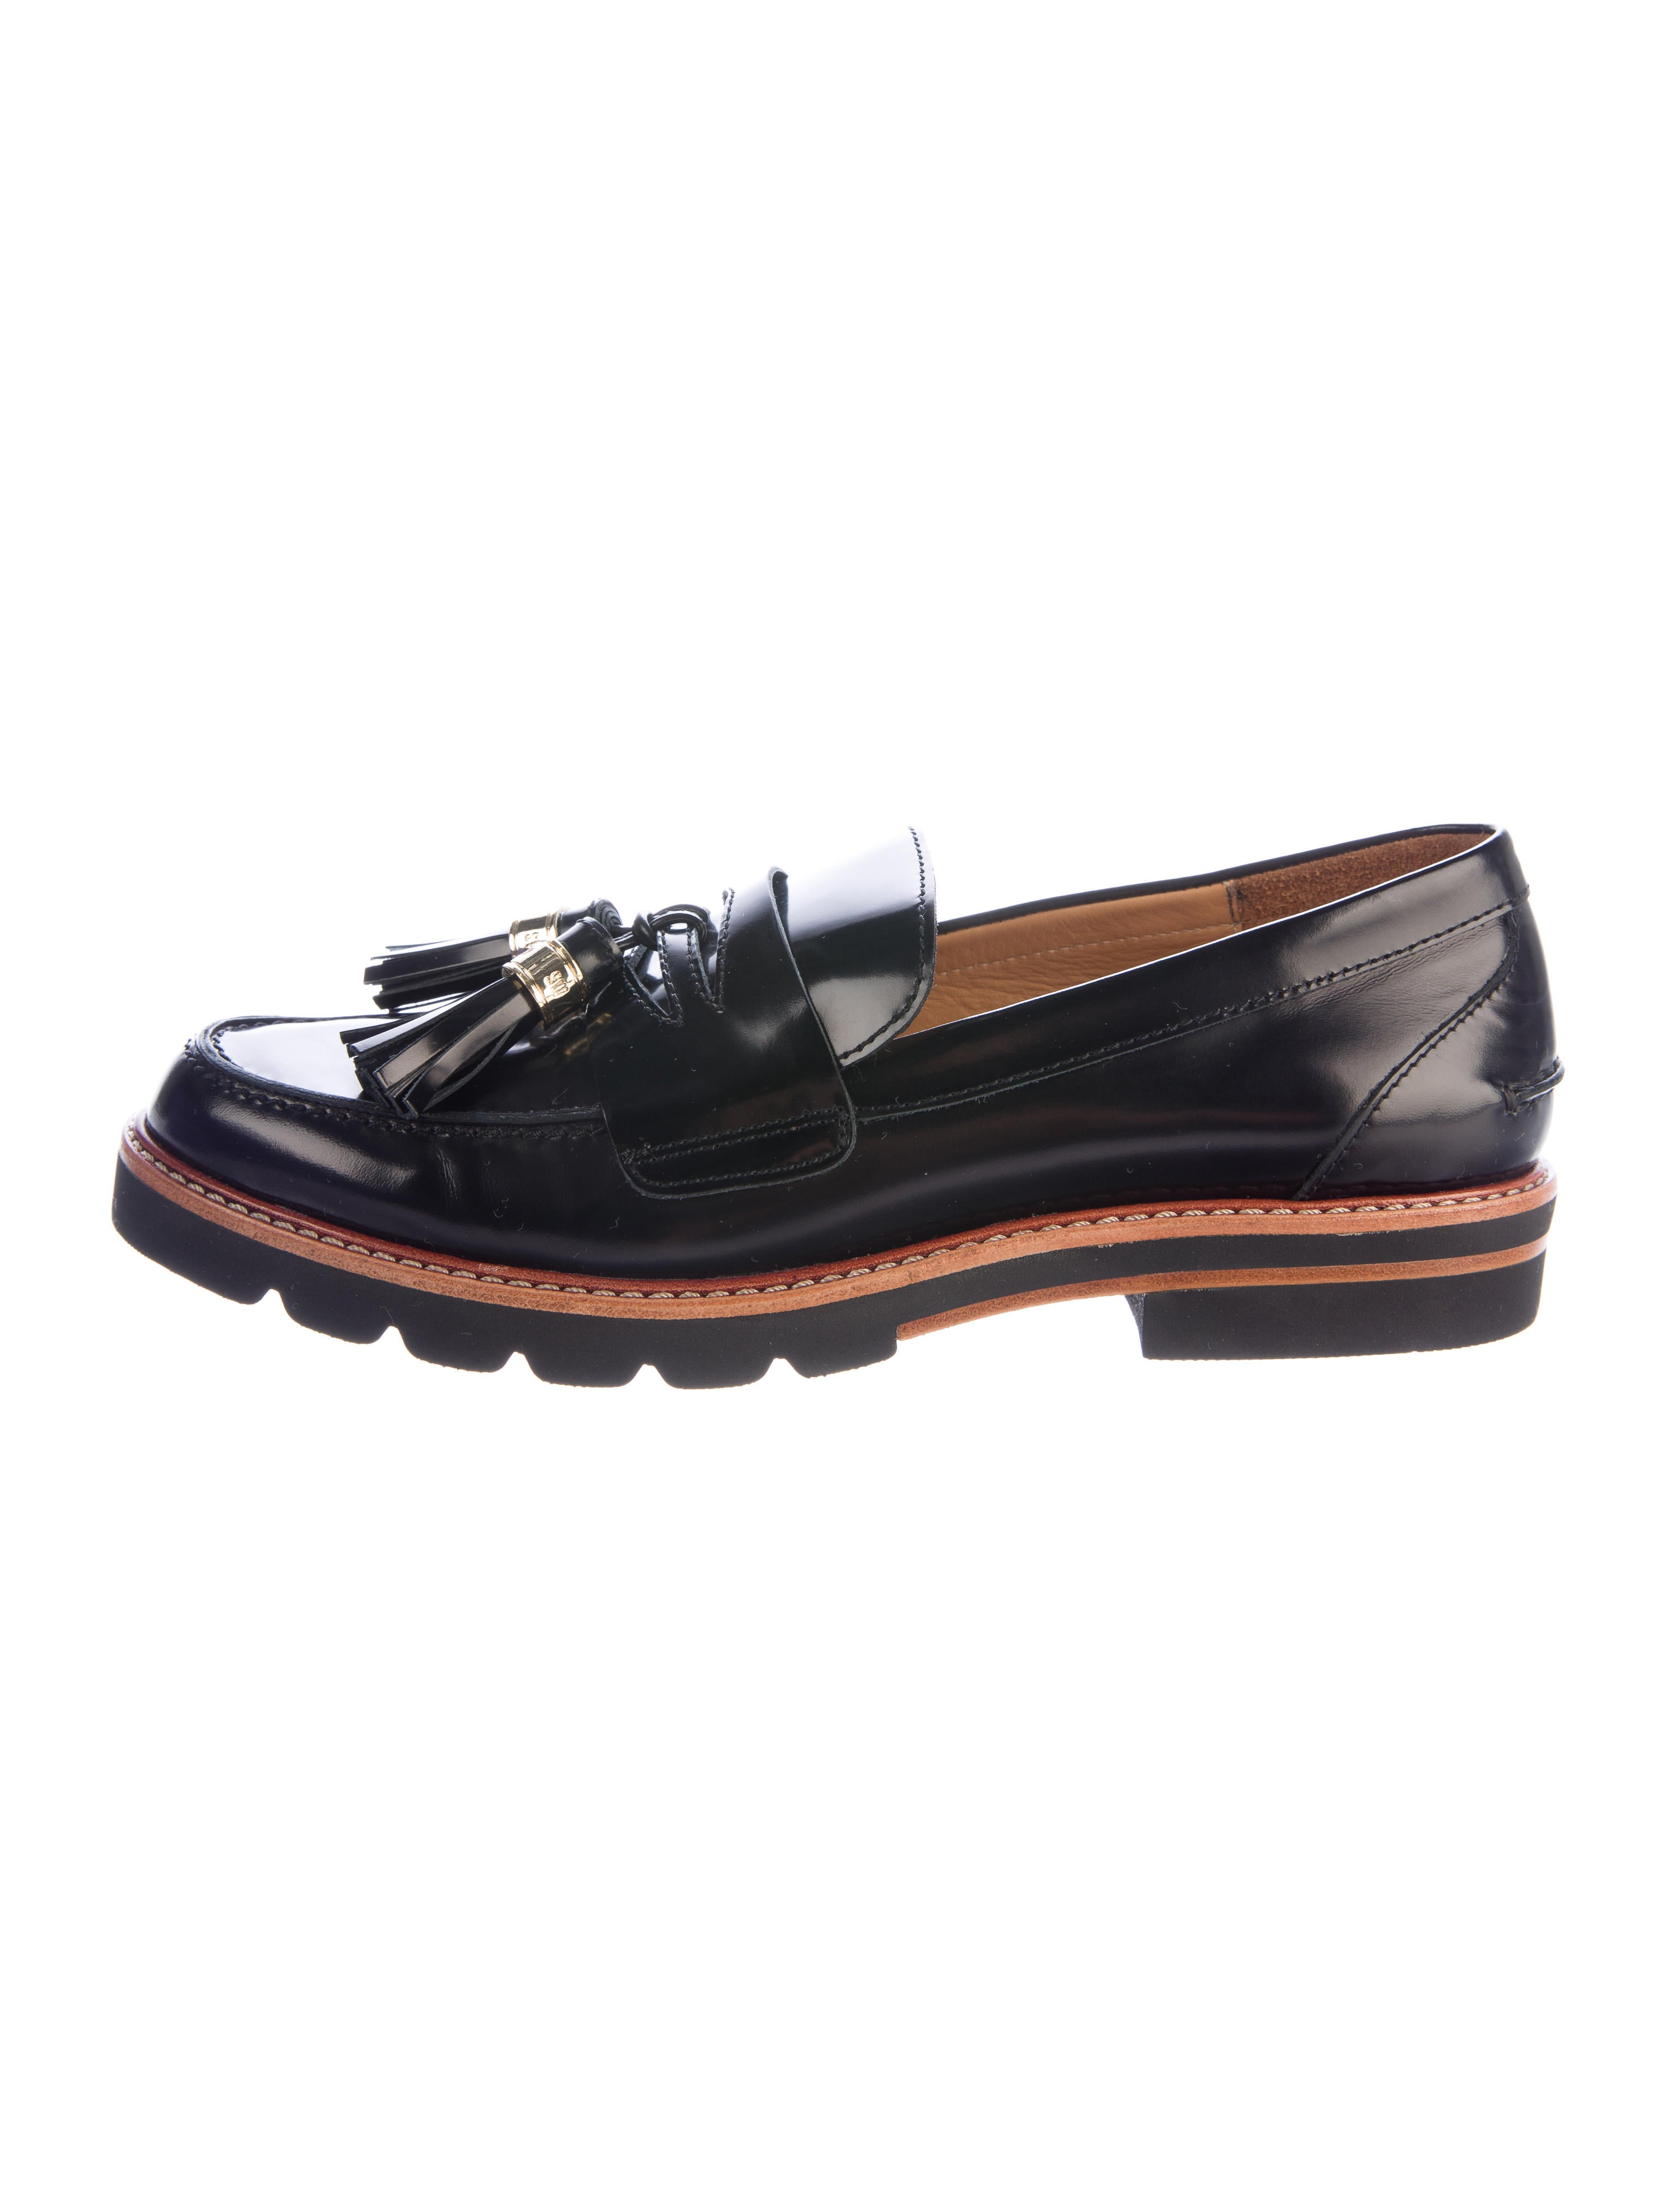 41aaca42b60 Stuart Weitzman Manila Slip-On Loafers - Shoes - WSU31714